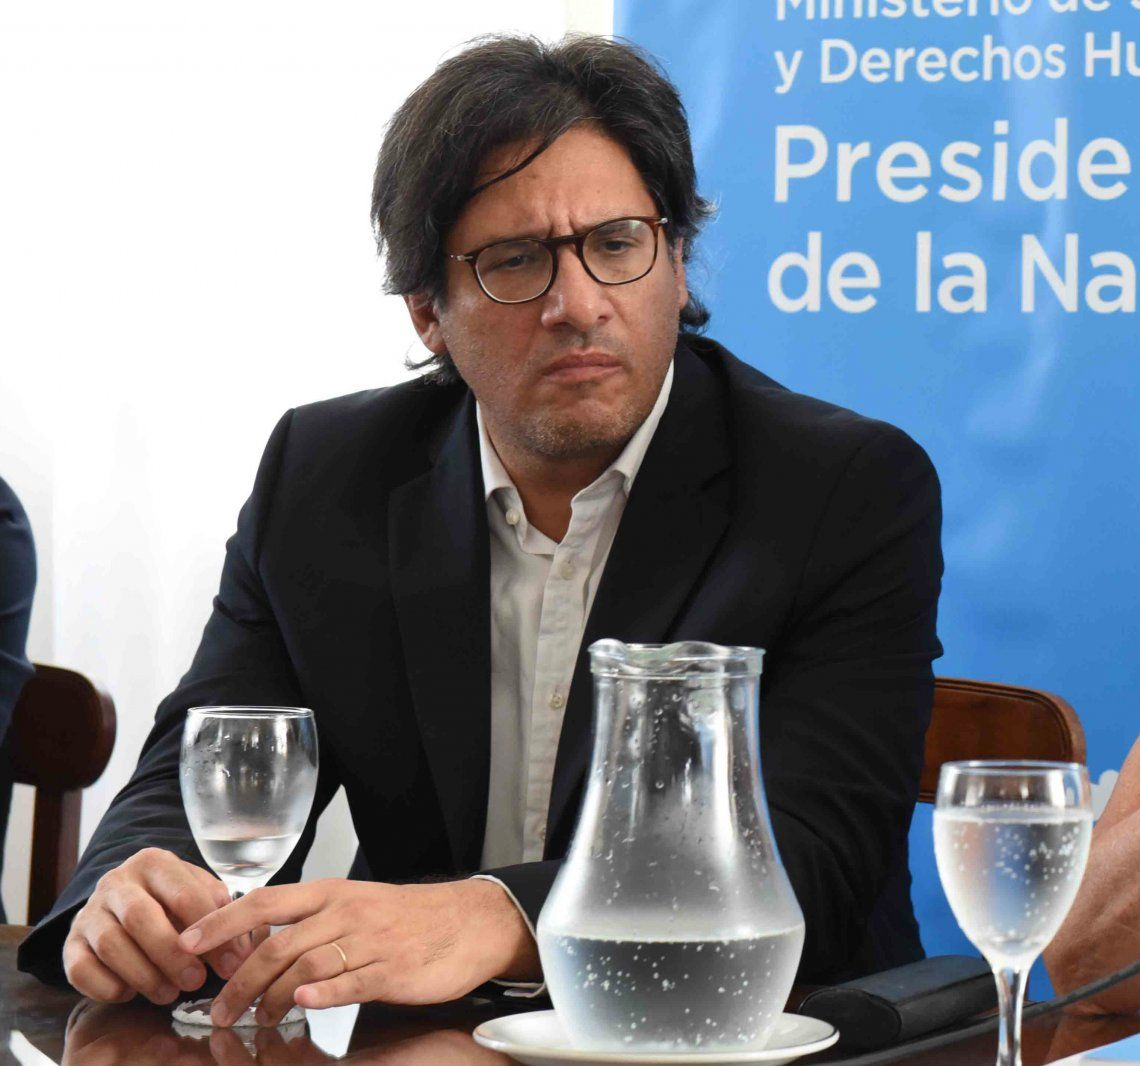 Garavano defendió la independencia del Poder Judicial.